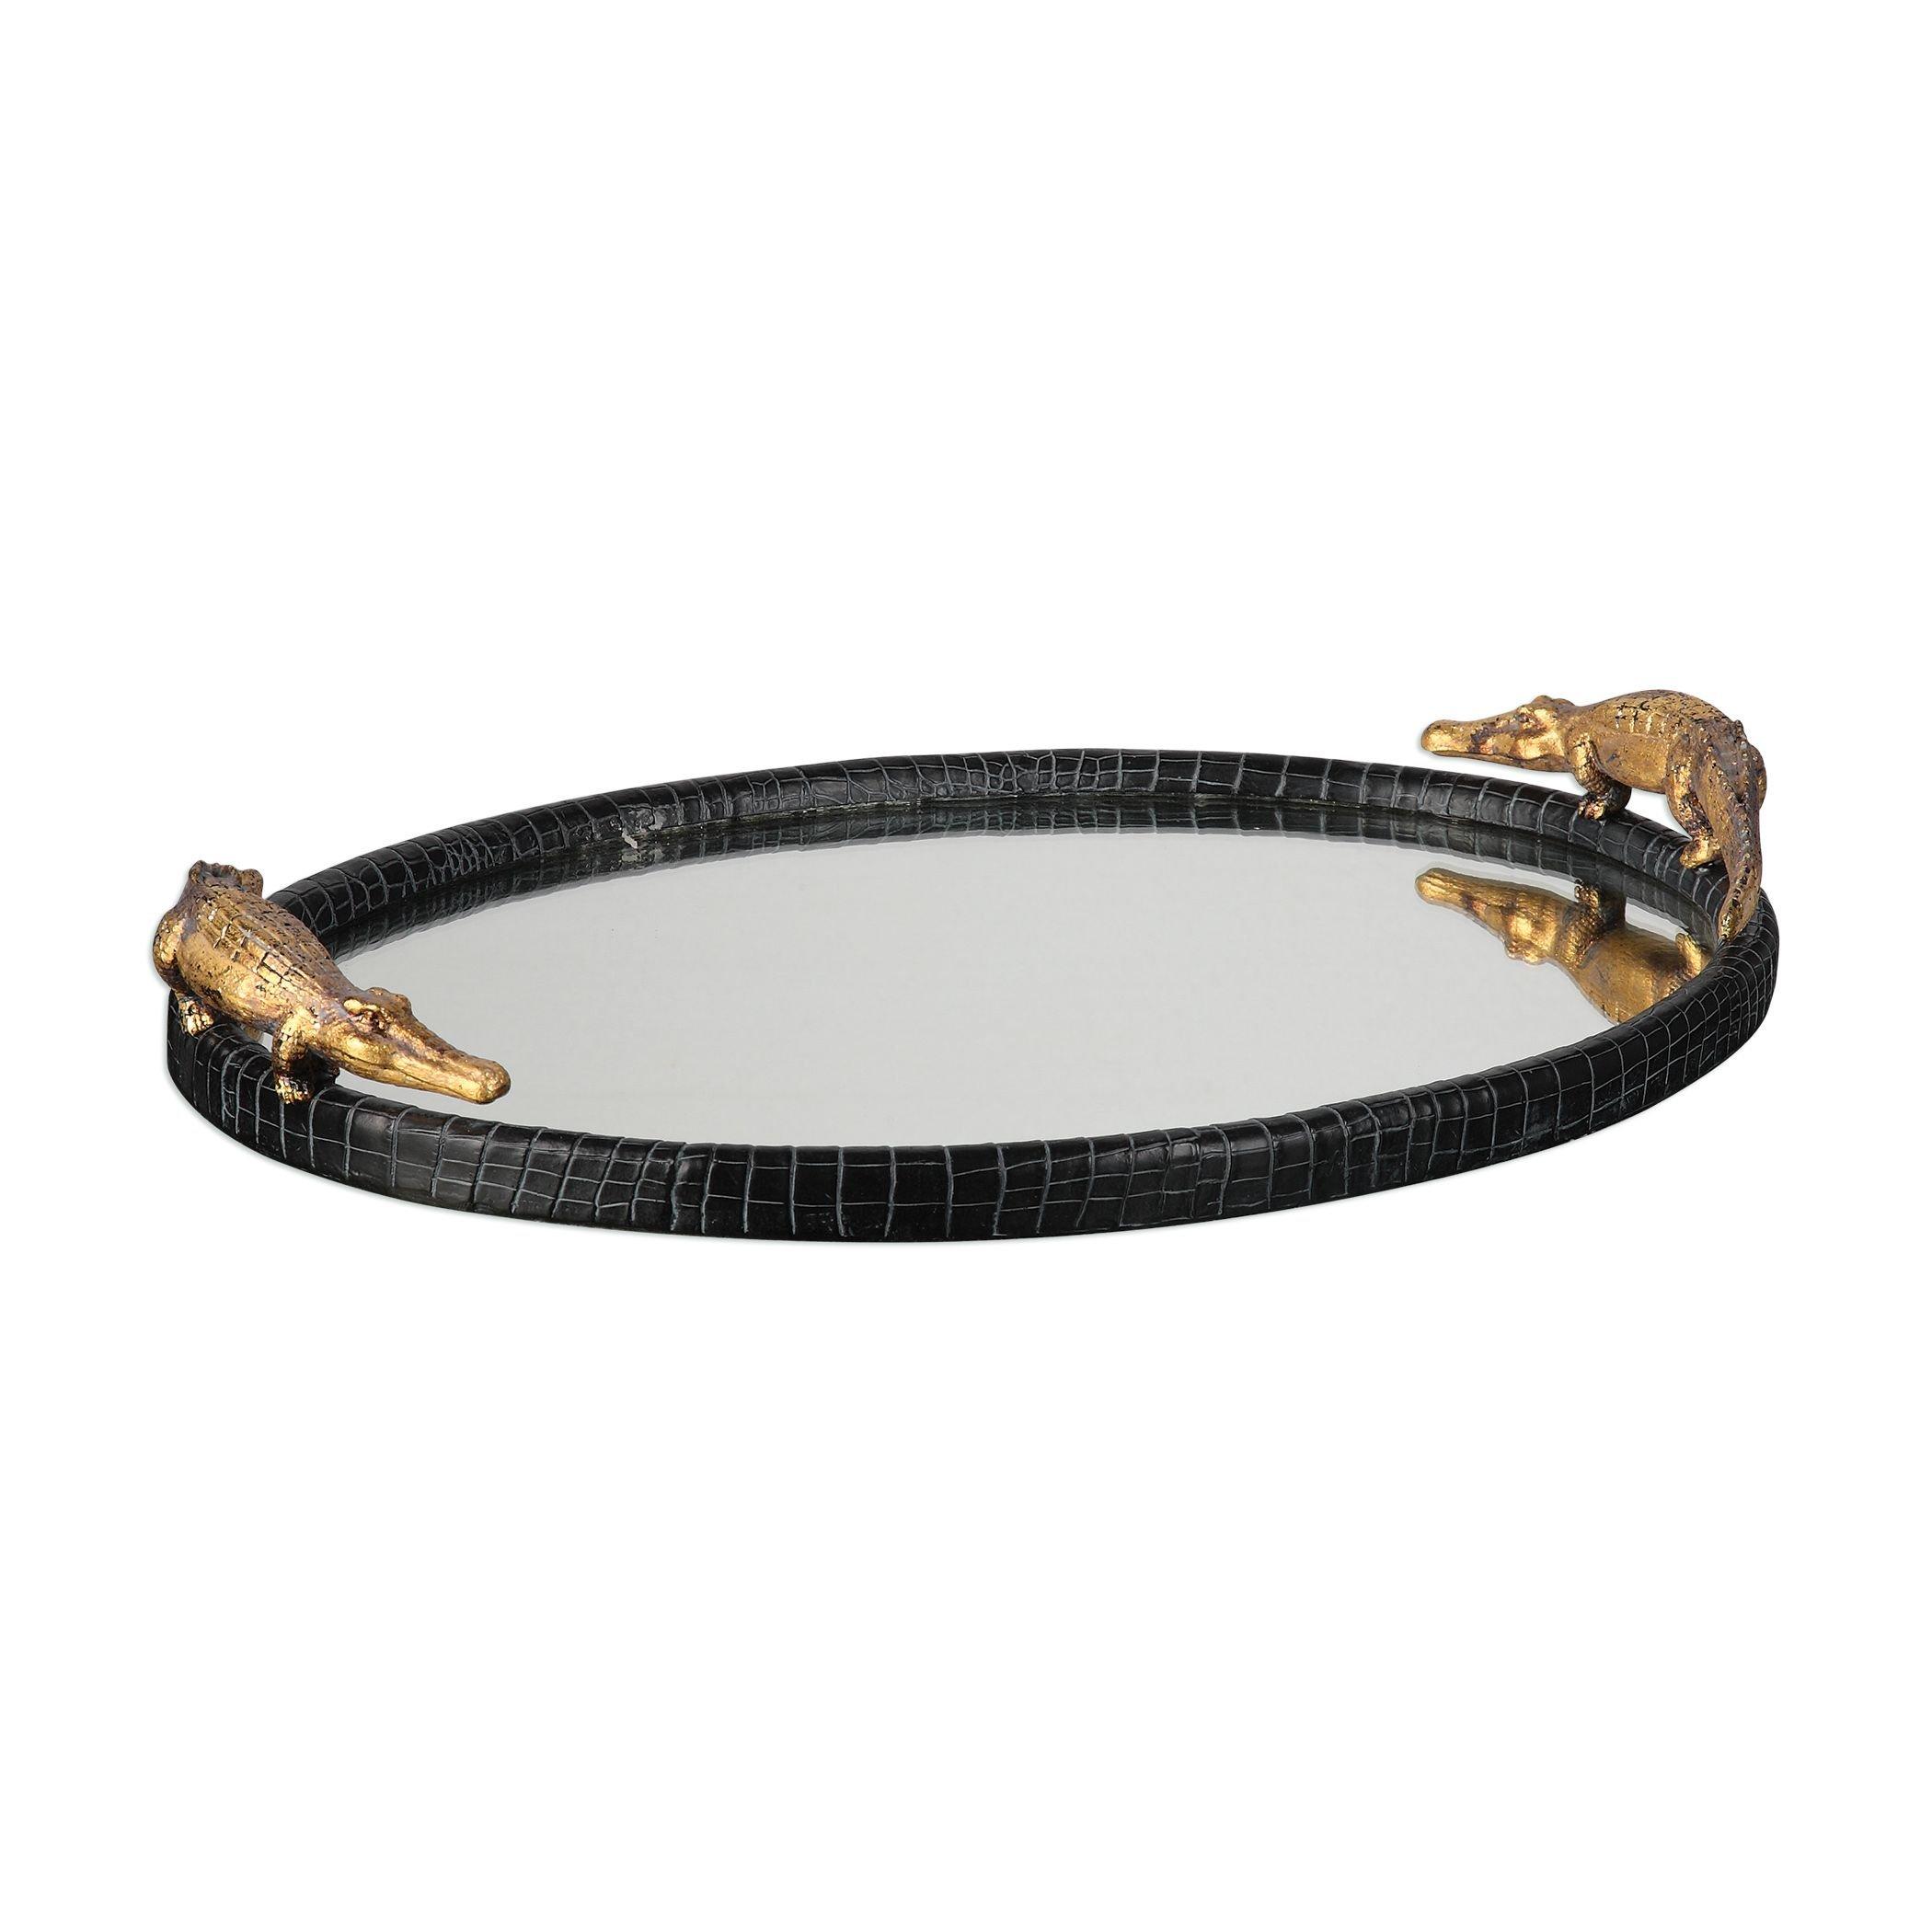 Alligator Crocodile Bar Serving Tray | Decorative Handles Round Mirrored Croc Reptile